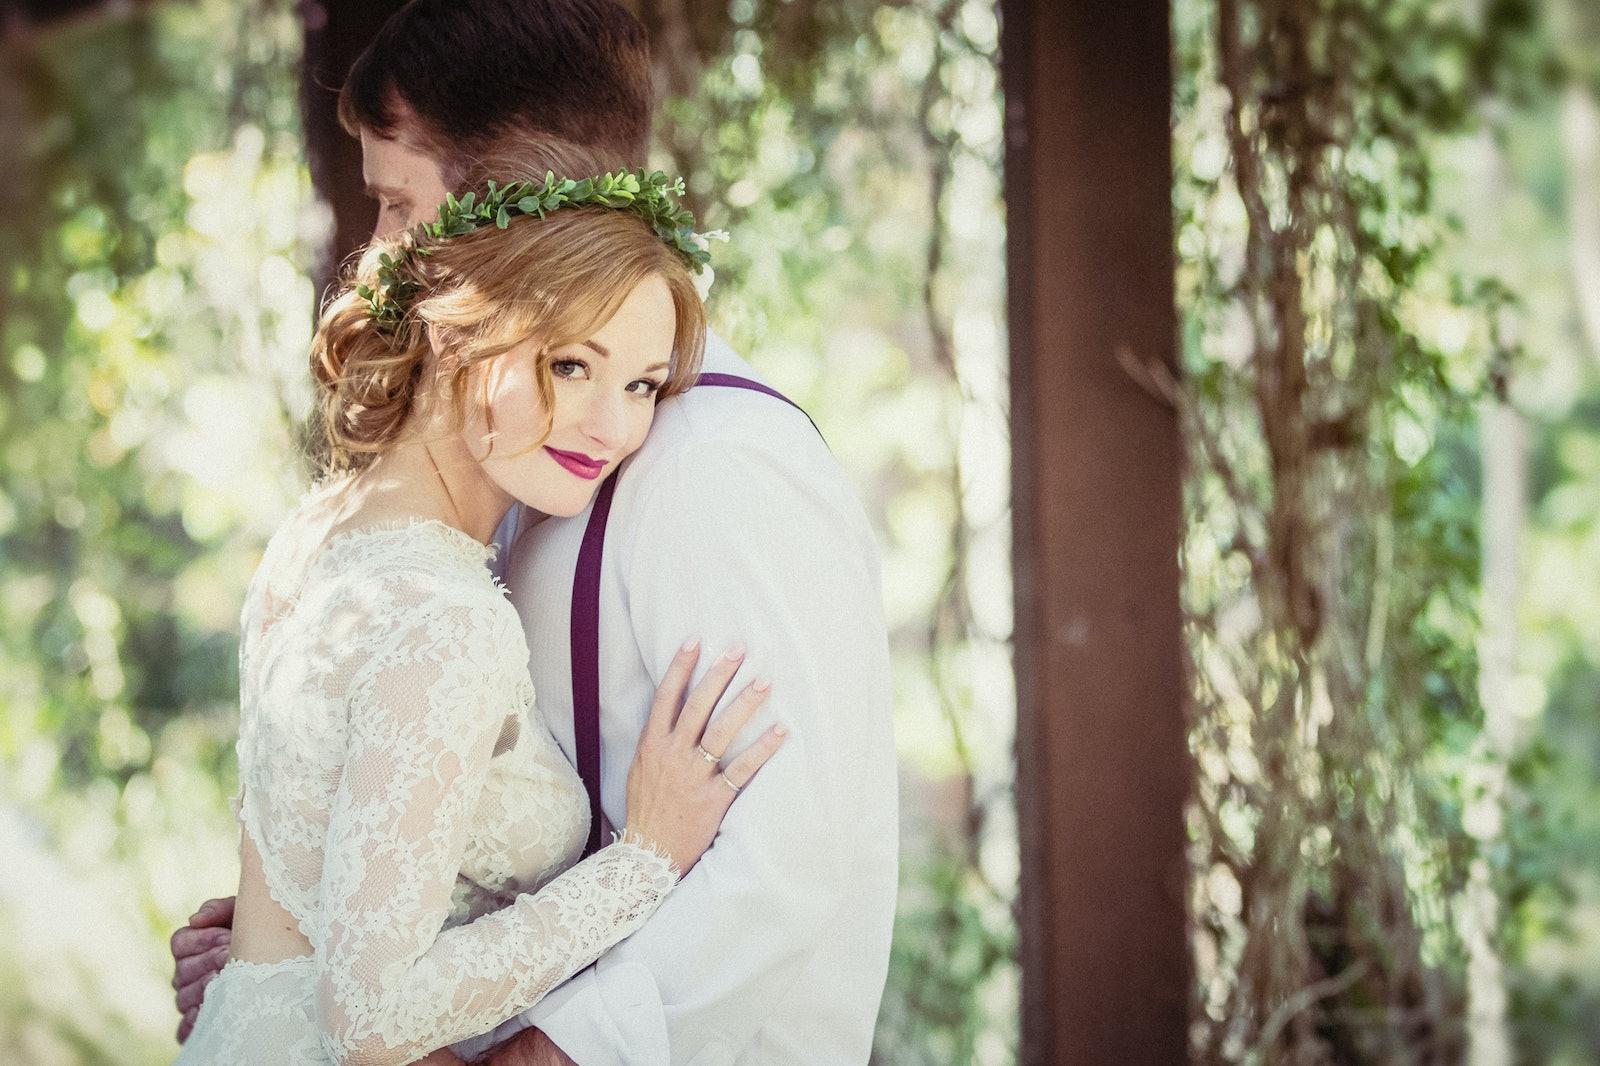 Brisbane Wedding Photograph by Sheona Beach - Brisbane Wedding Photograph by Sheona Beach